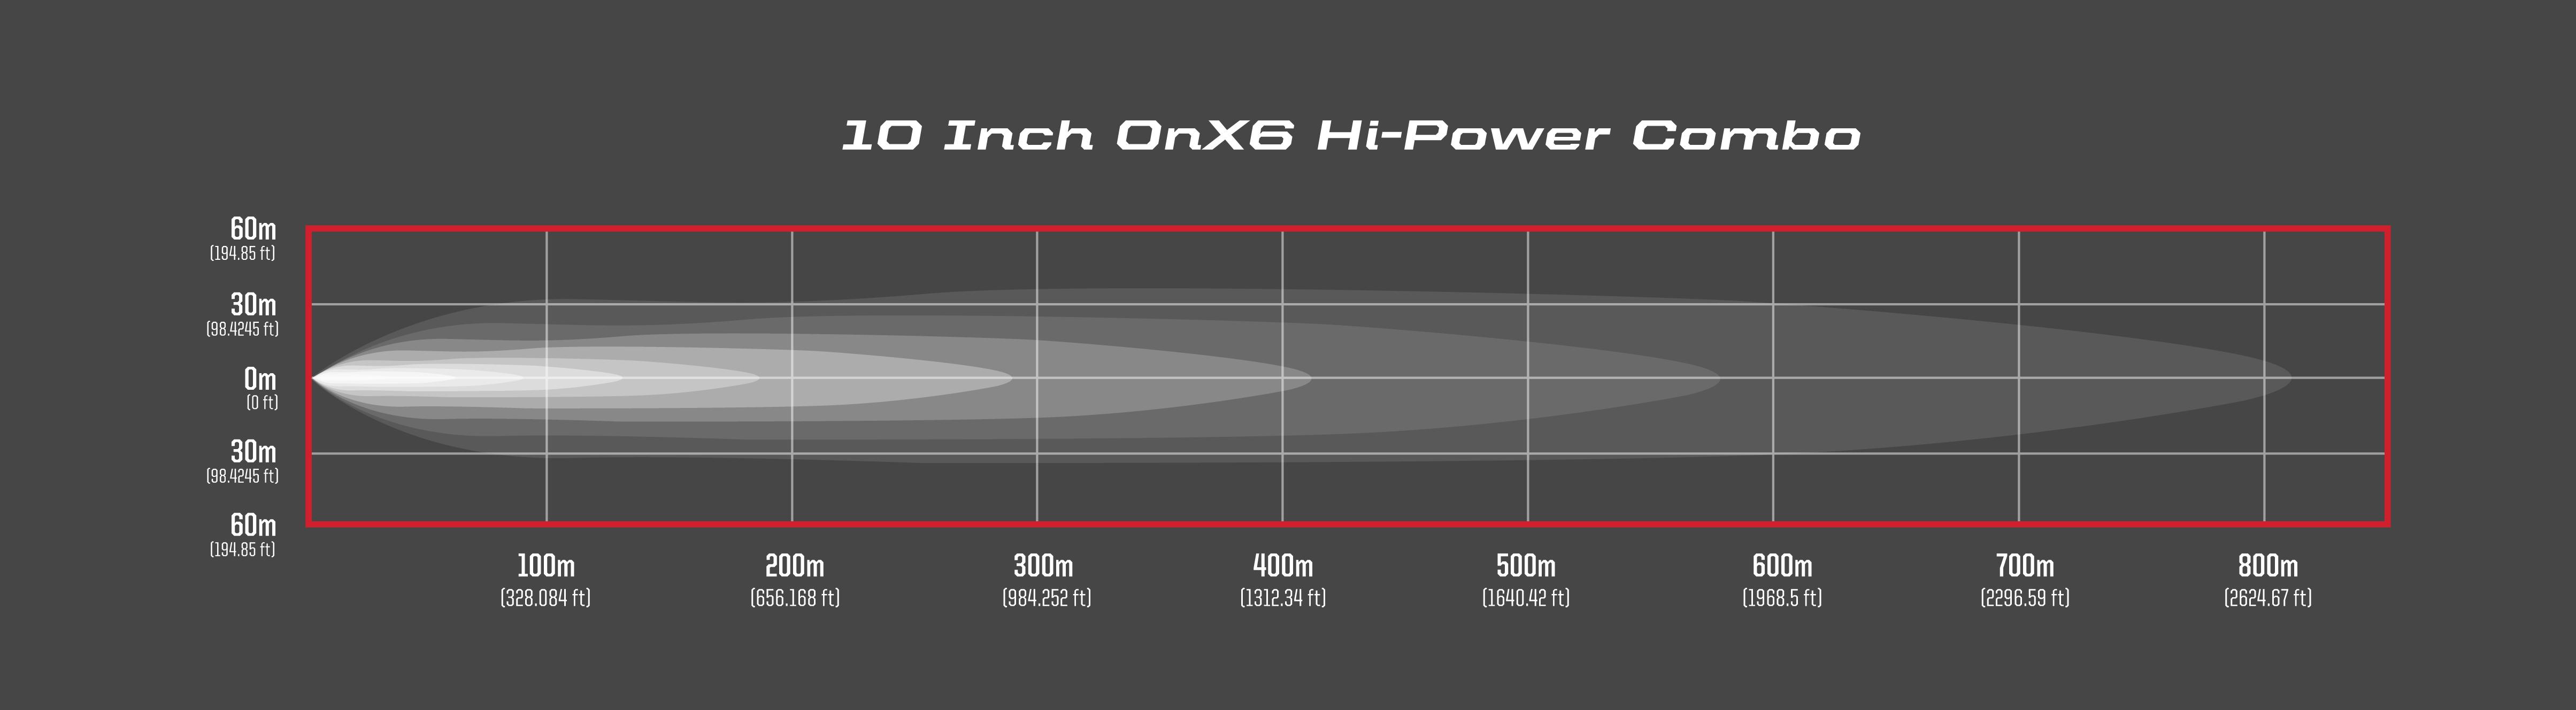 10-inch-onx6-hi-power-combo.jpg